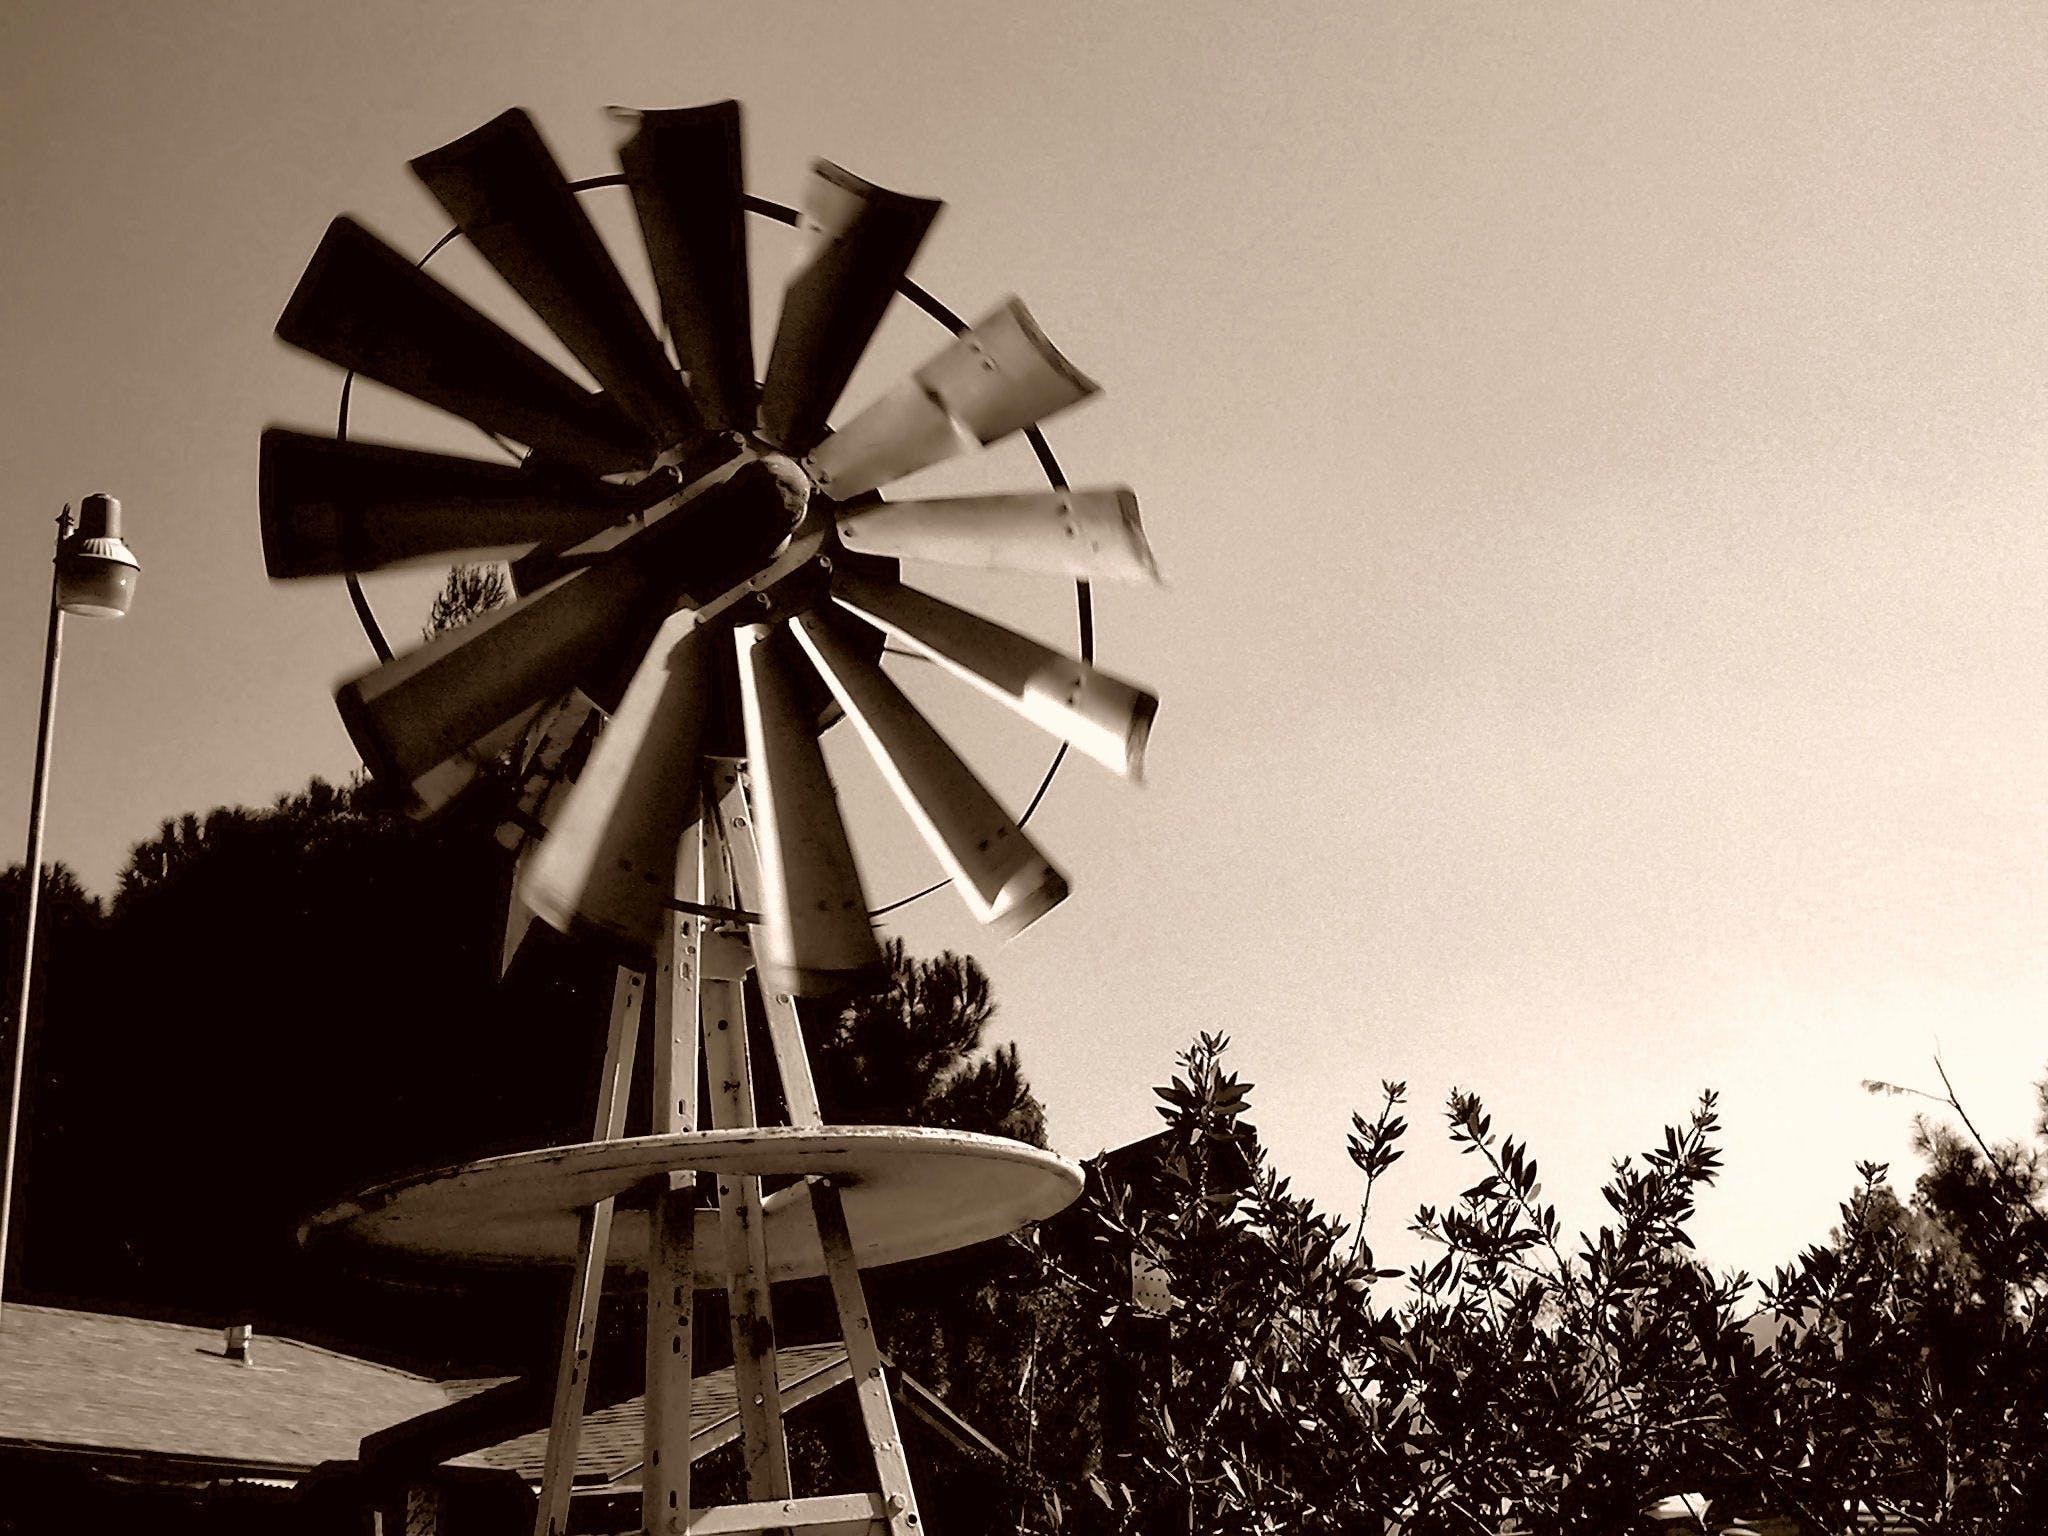 Free stock photo of farm, farming, windy